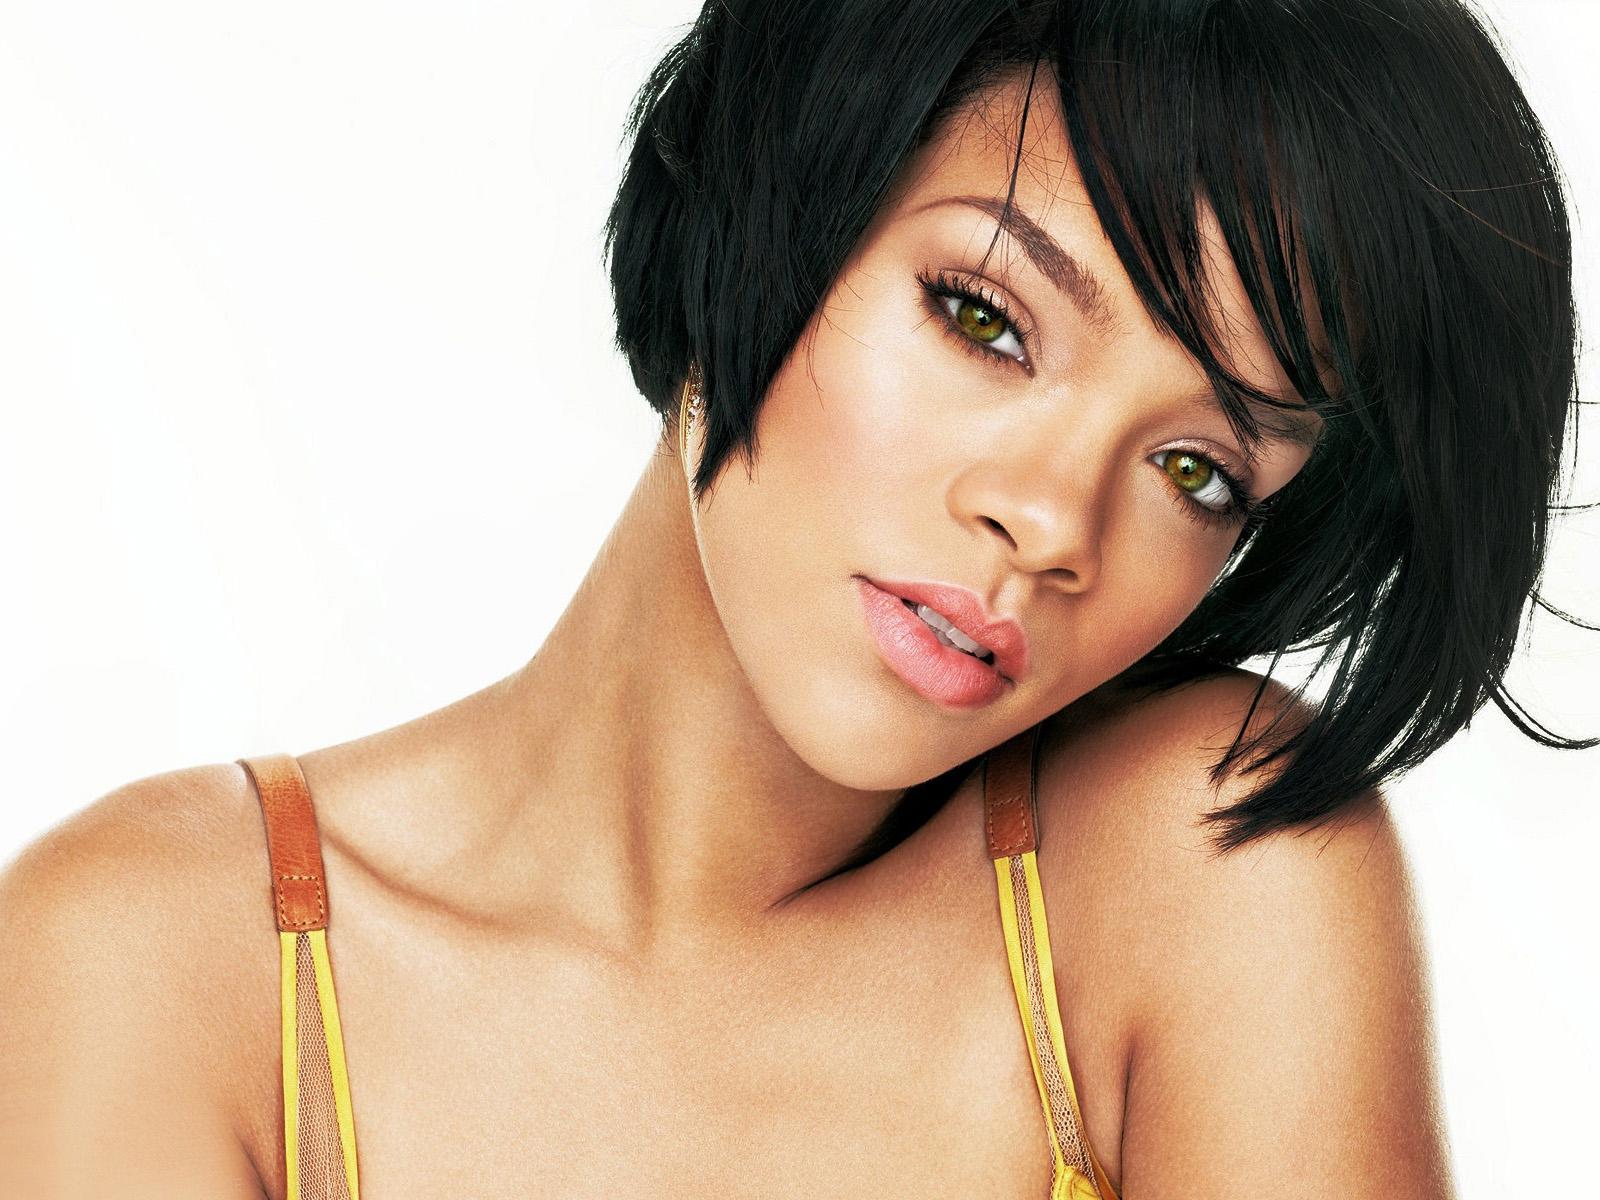 http://2.bp.blogspot.com/-T8fViNPMEAk/T7VYKq-lgwI/AAAAAAAAA4M/JmMqnDII5rY/s1600/Rihanna+Wallpapers+Free+Download+03.jpg